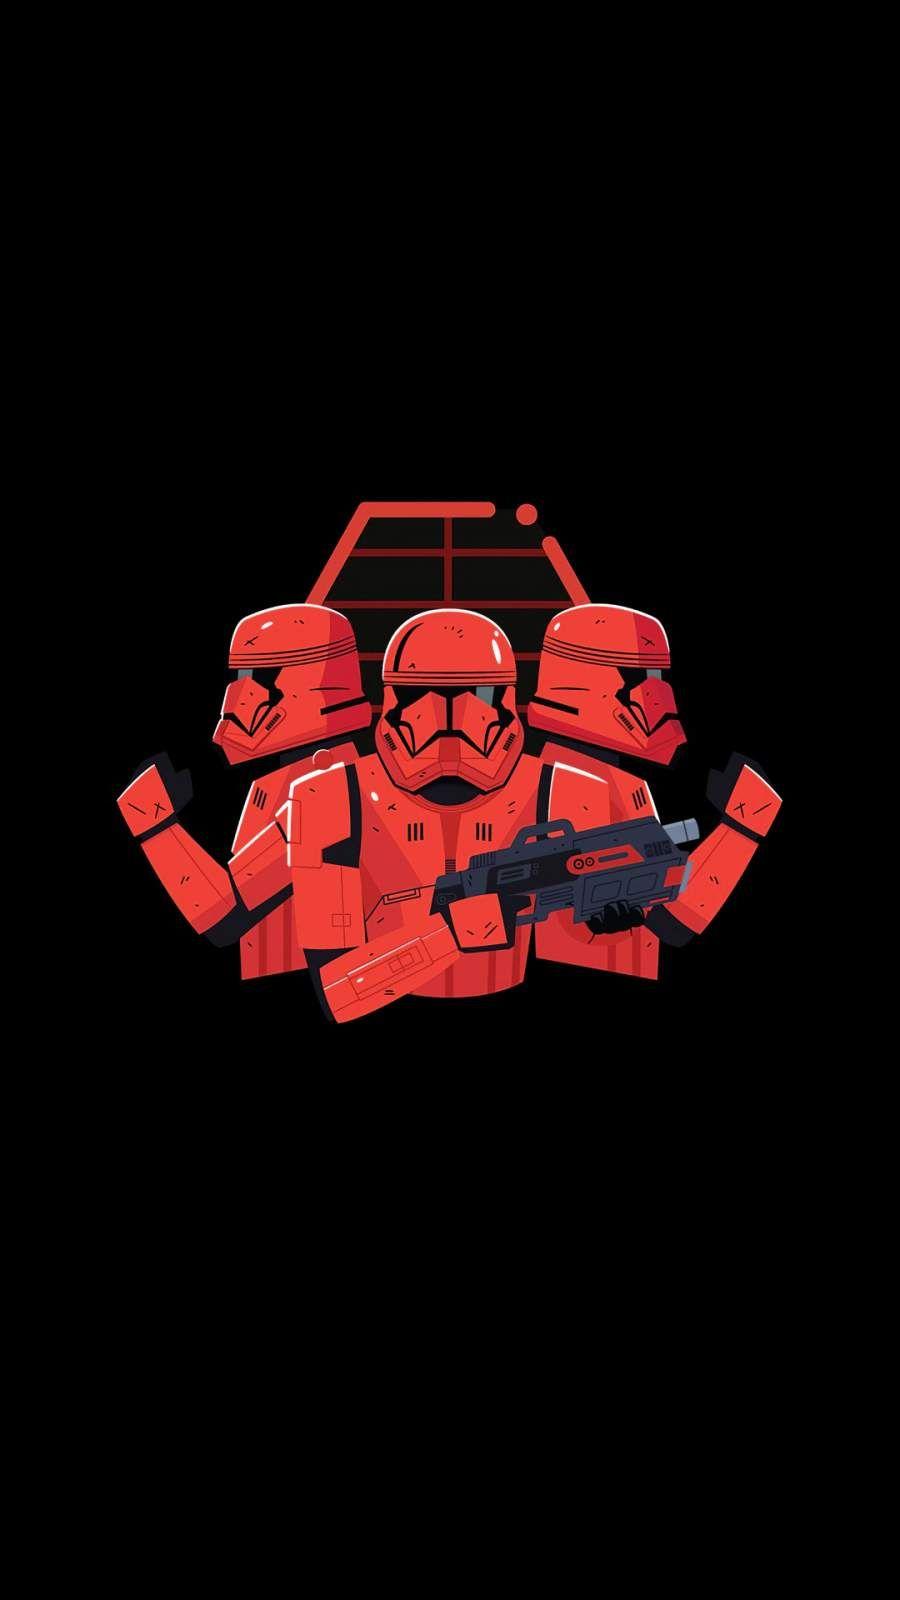 Star Wars Stormtrooper Iphone Wallpaper In 2021 Star Wars Movies Ranked Star Wars Wallpaper Iphone Star Wars Background